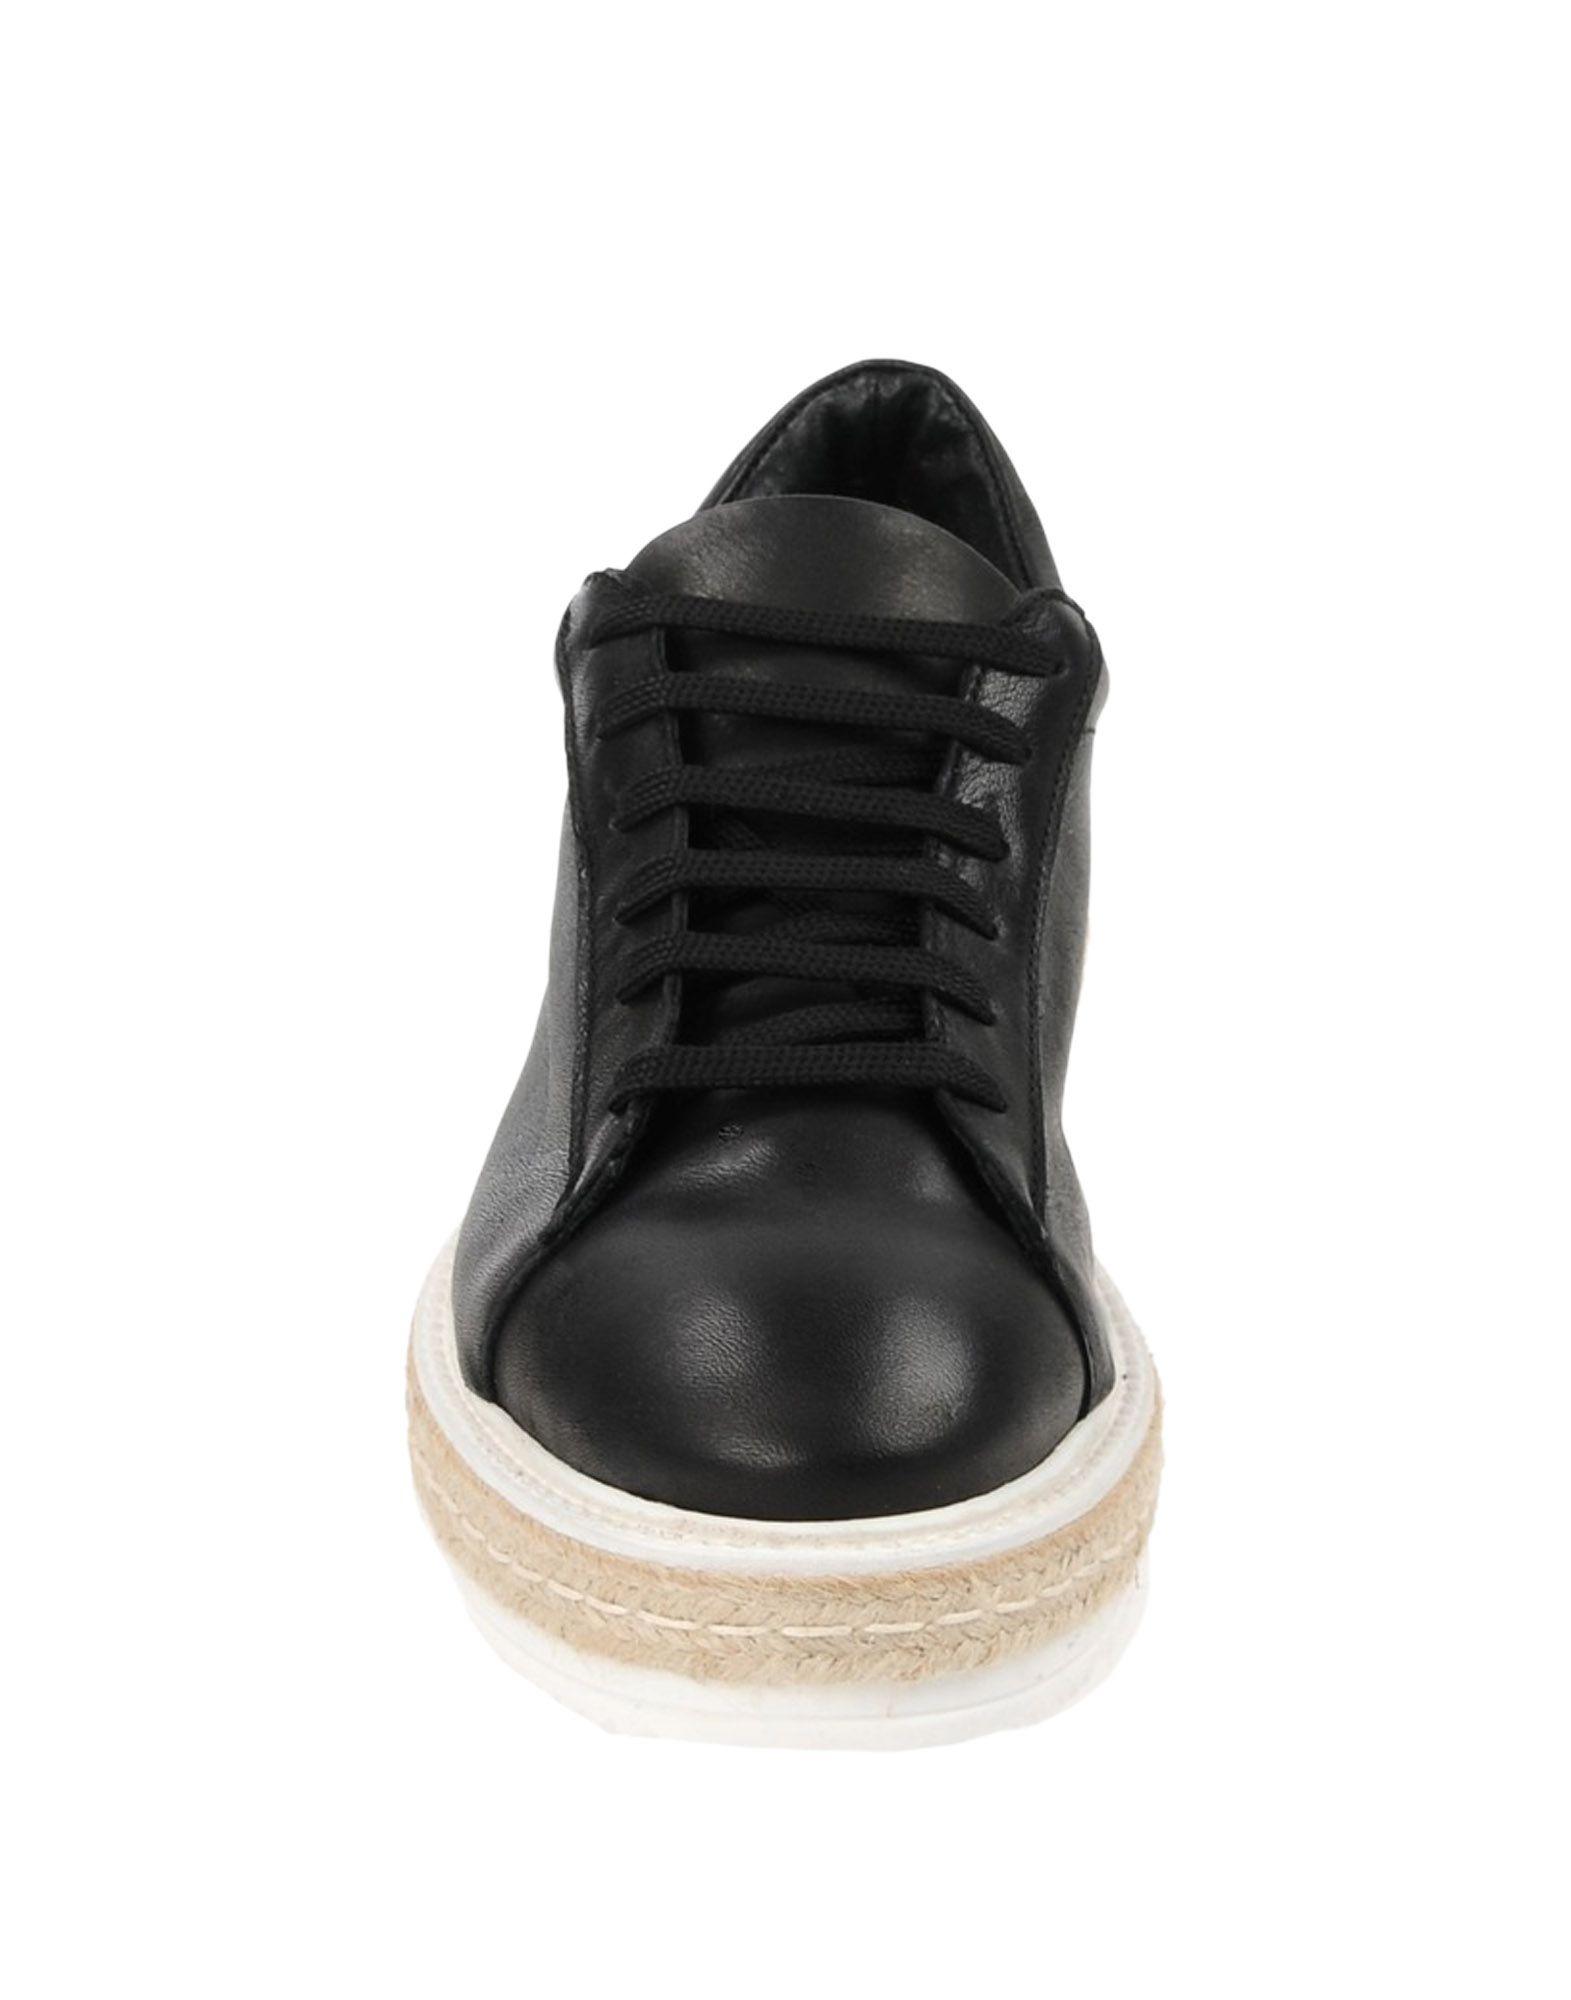 George J. Love Sneakers Damen  11441743FK Gute Qualität beliebte Schuhe